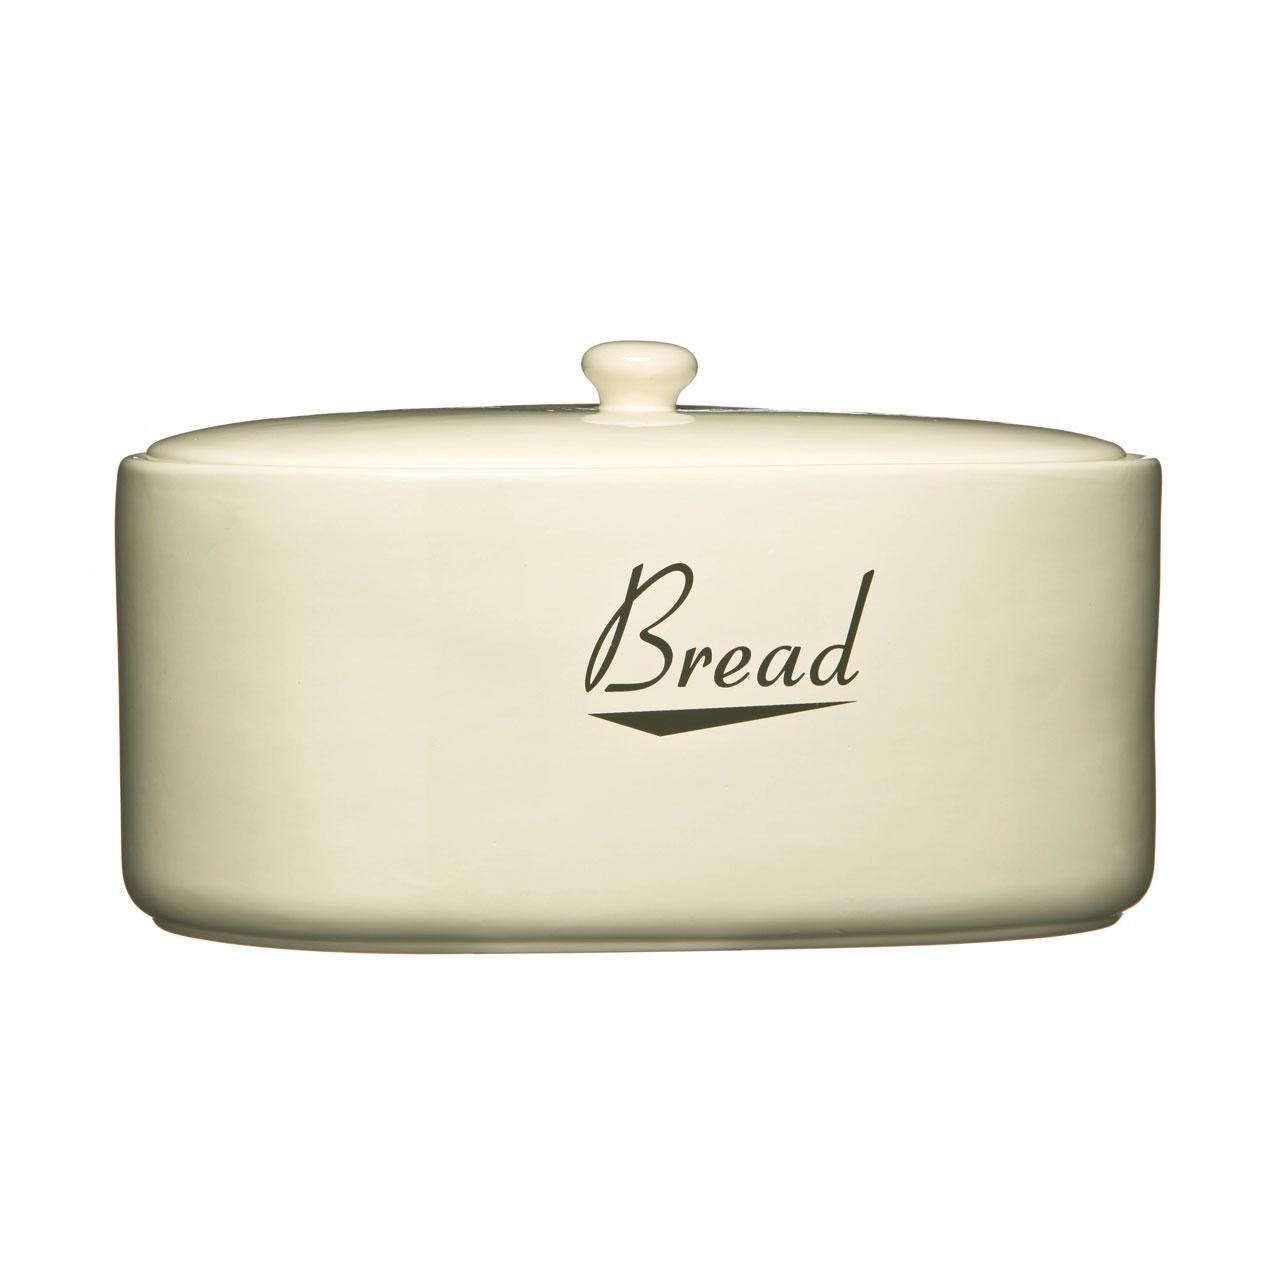 Cream Coronet Kitchen Ceramic Storage Canisters Jars Set Tea Coffee Sugar Bread Ebay